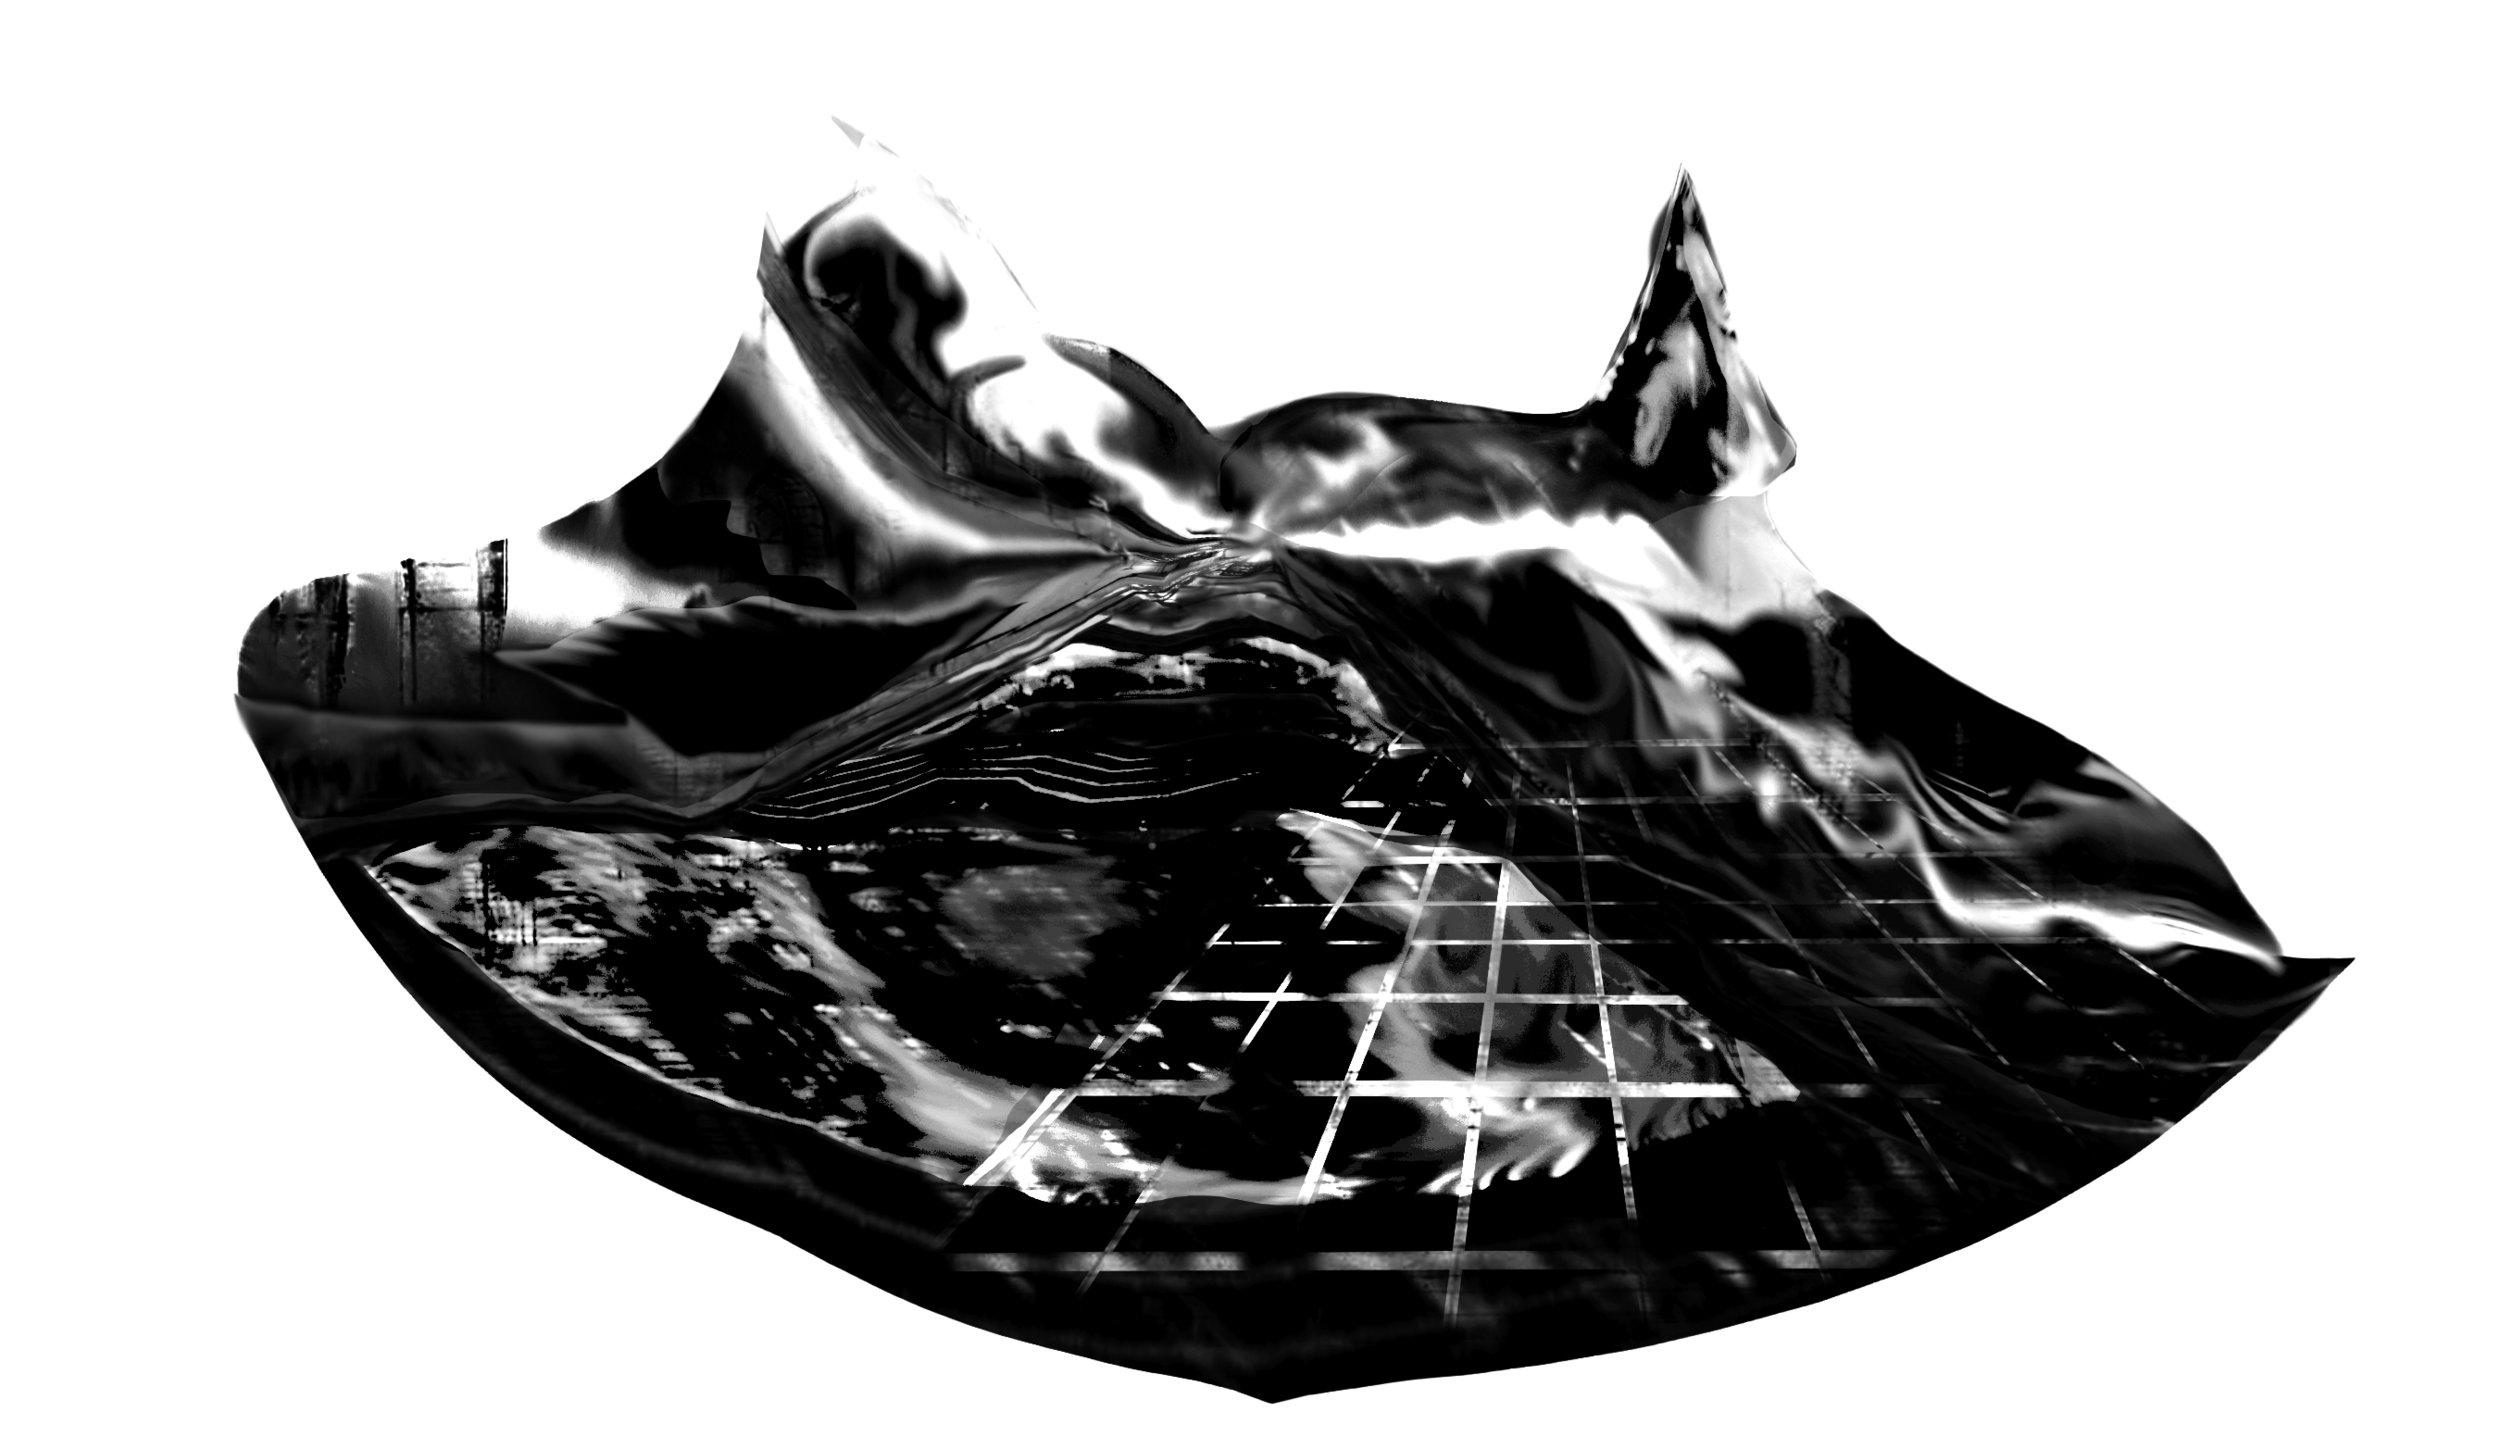 perspective warp bwfinal.jpg